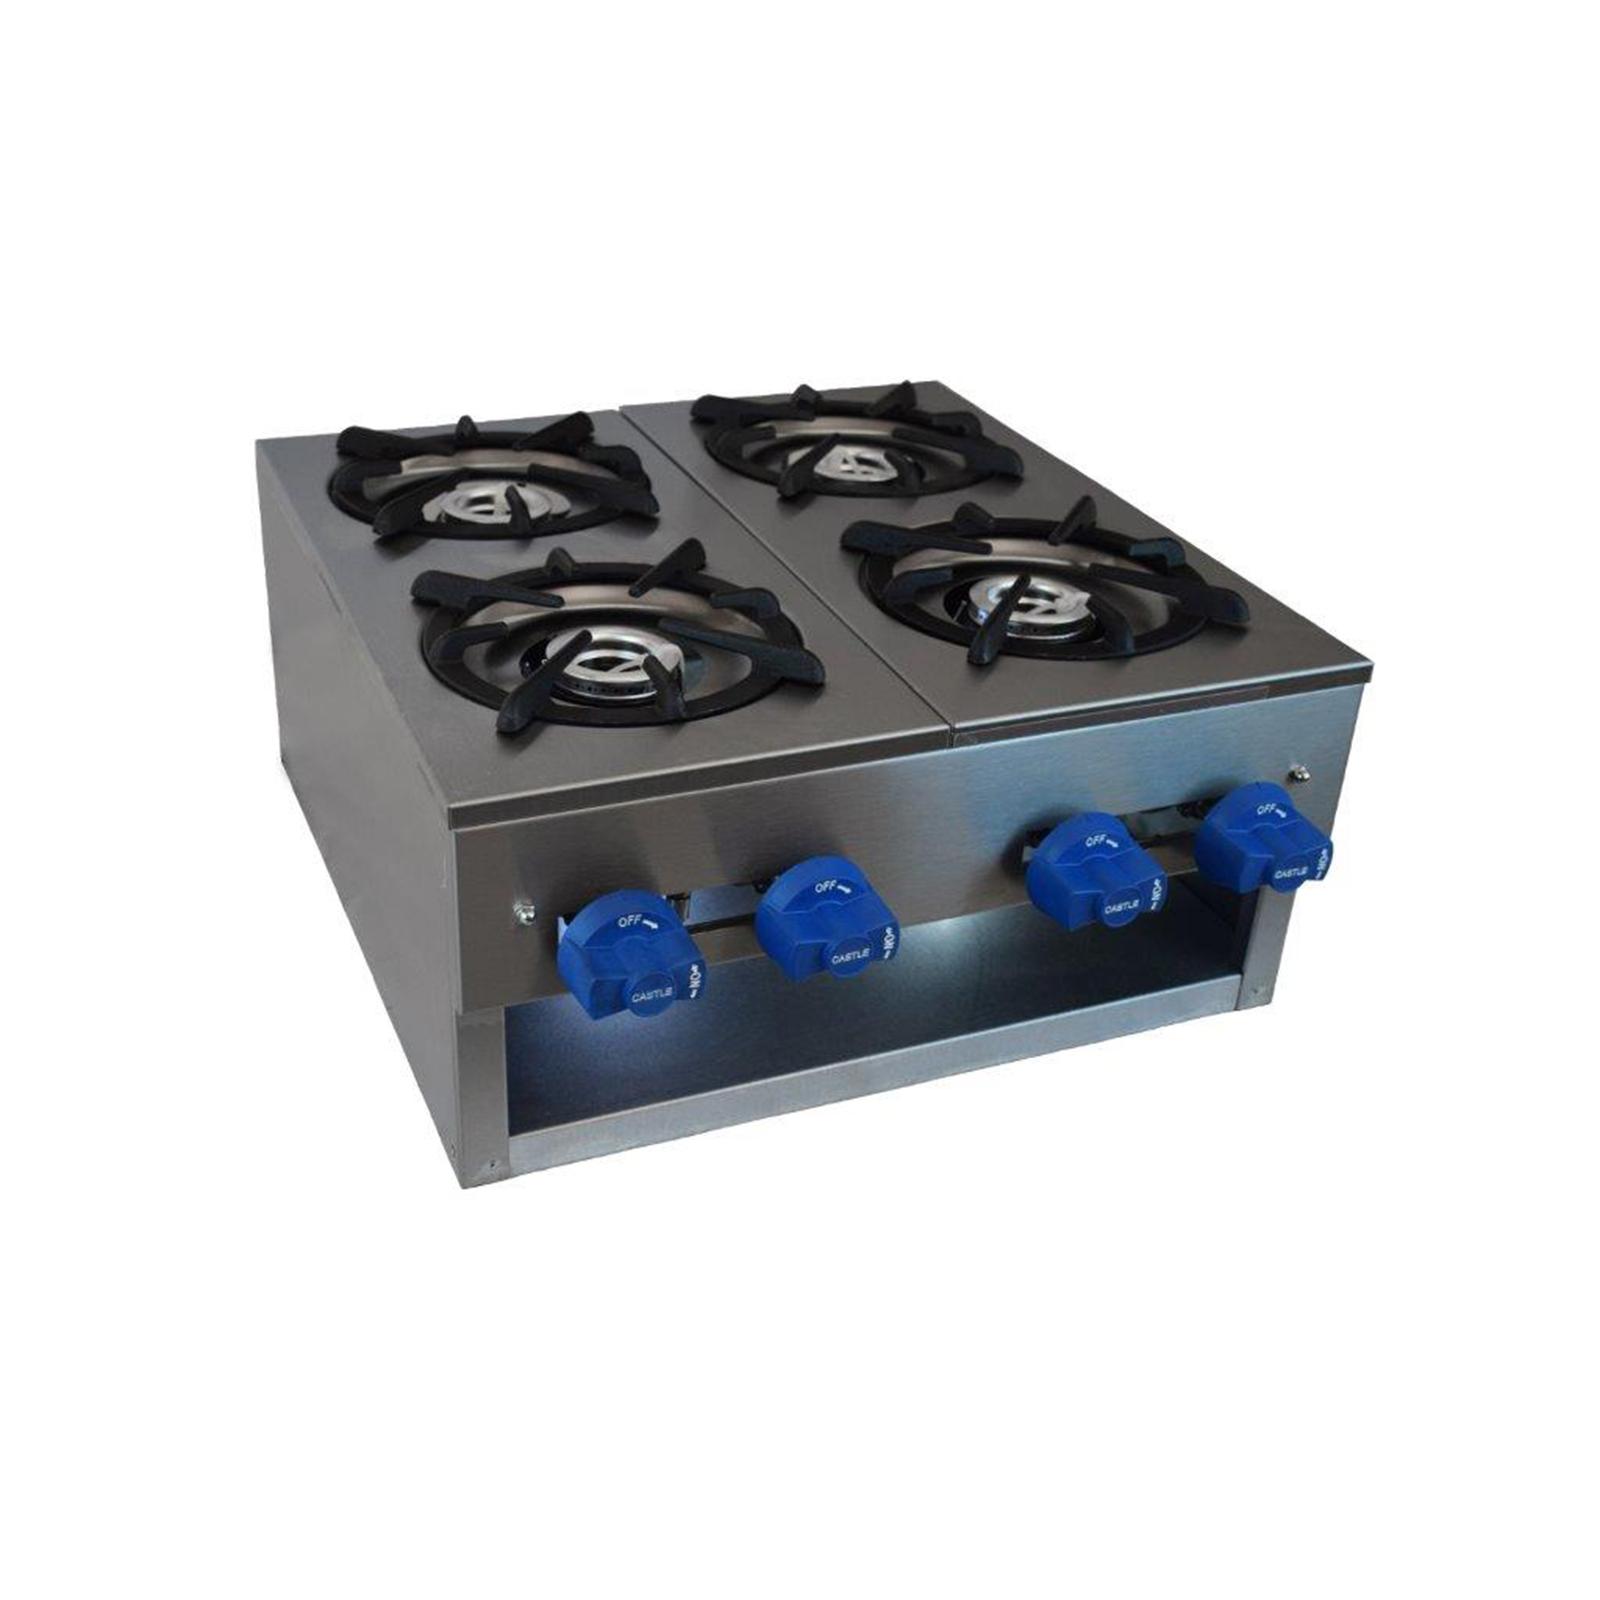 Comstock-Castle 1092 hotplate, countertop, gas